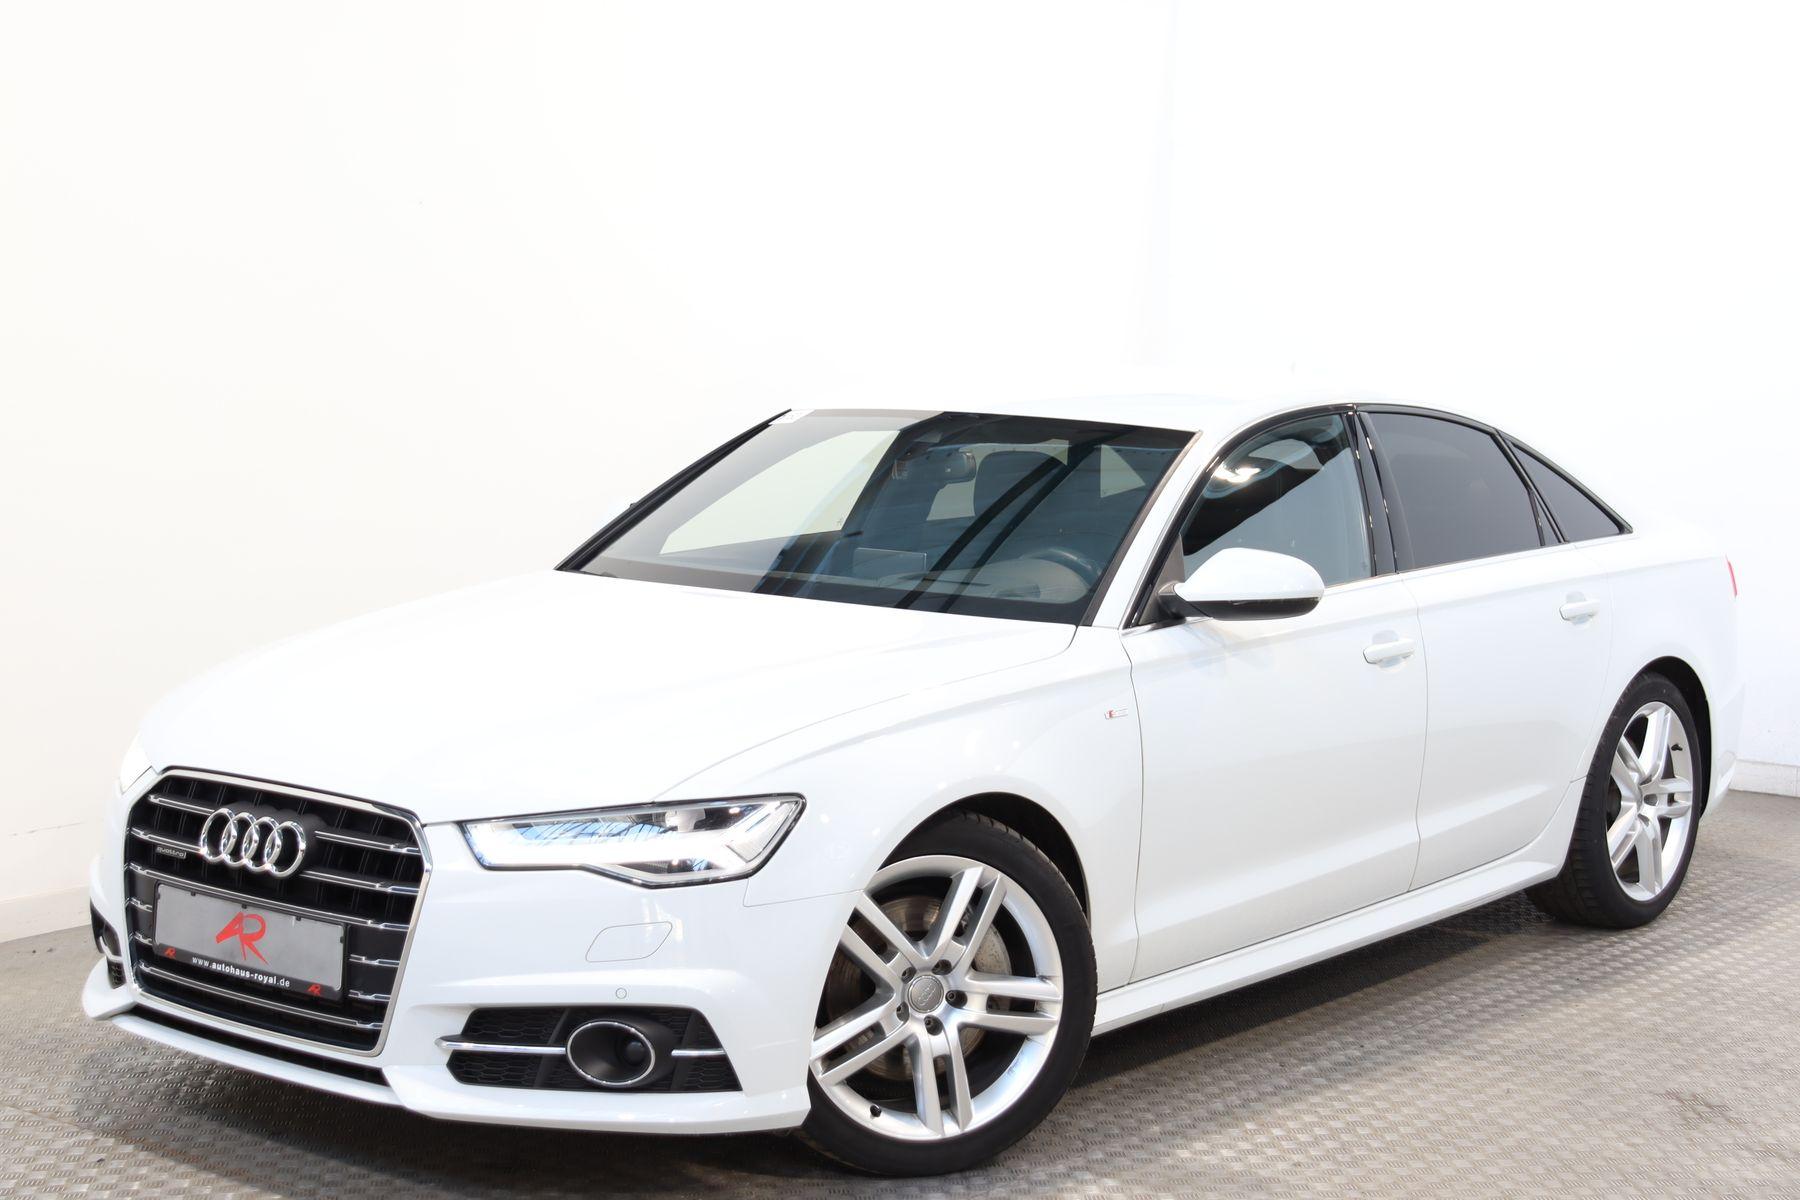 Audi A6 3.0 TDI qu 3x S LINE LUFTFEDERUNG,HUD,ACC,LED, Jahr 2016, Diesel